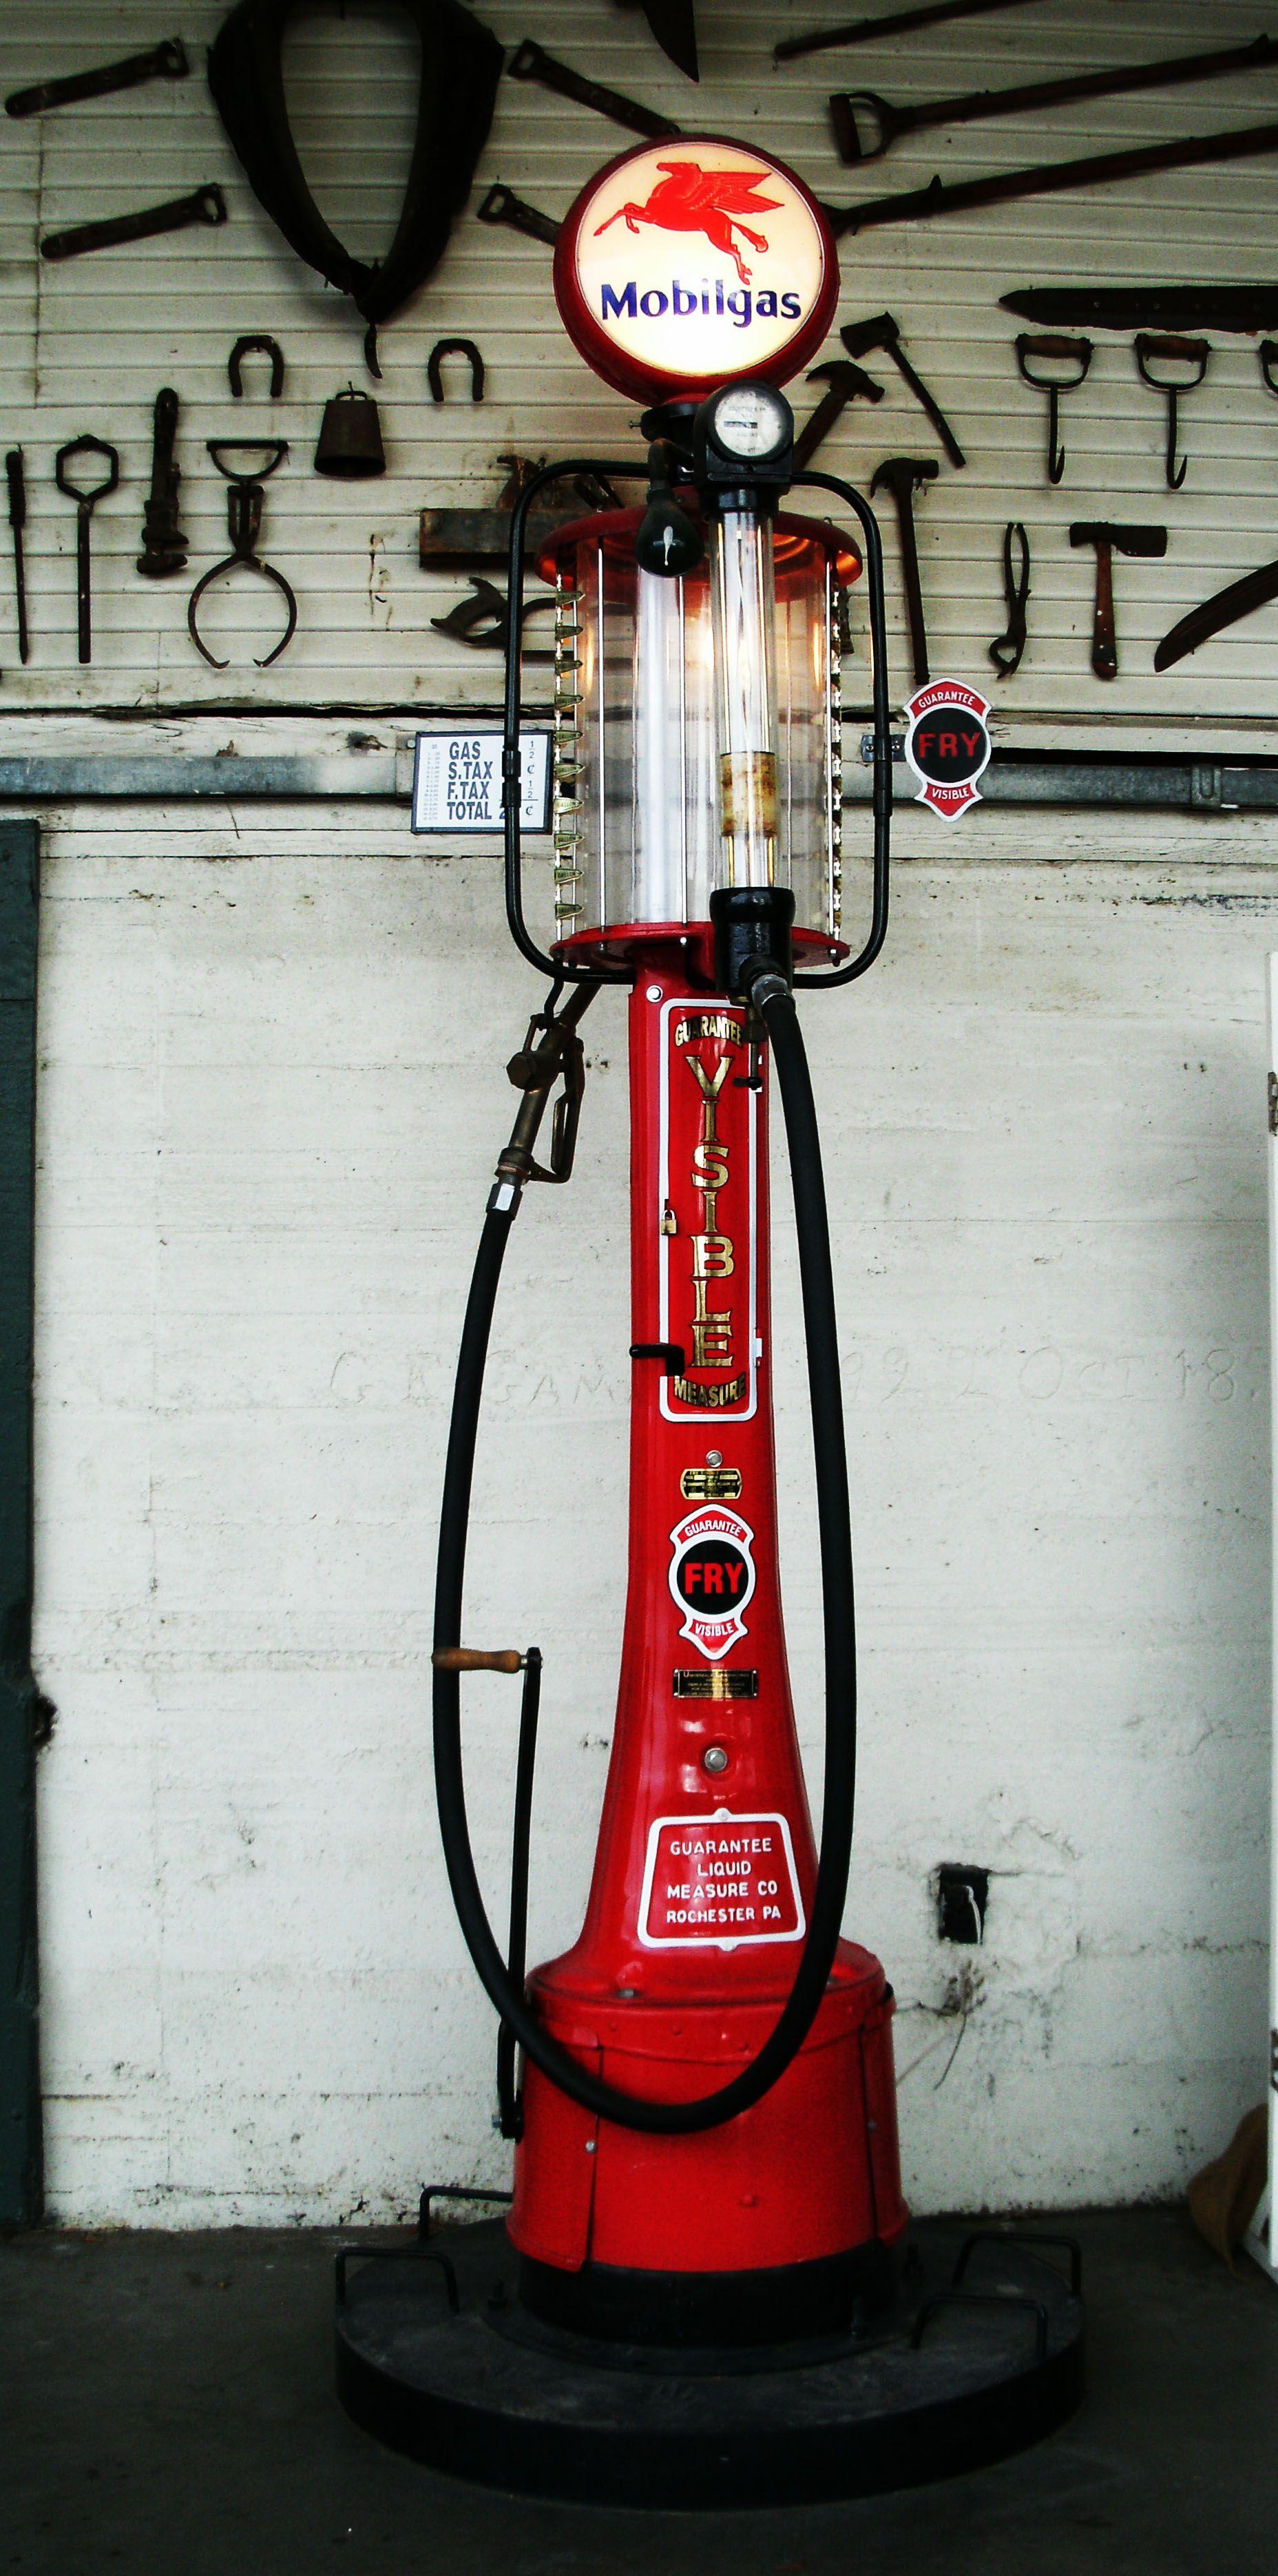 Find Gas Stations >> Old gas pump … | Vintage gas pumps, Old gas pumps, Gas pumps